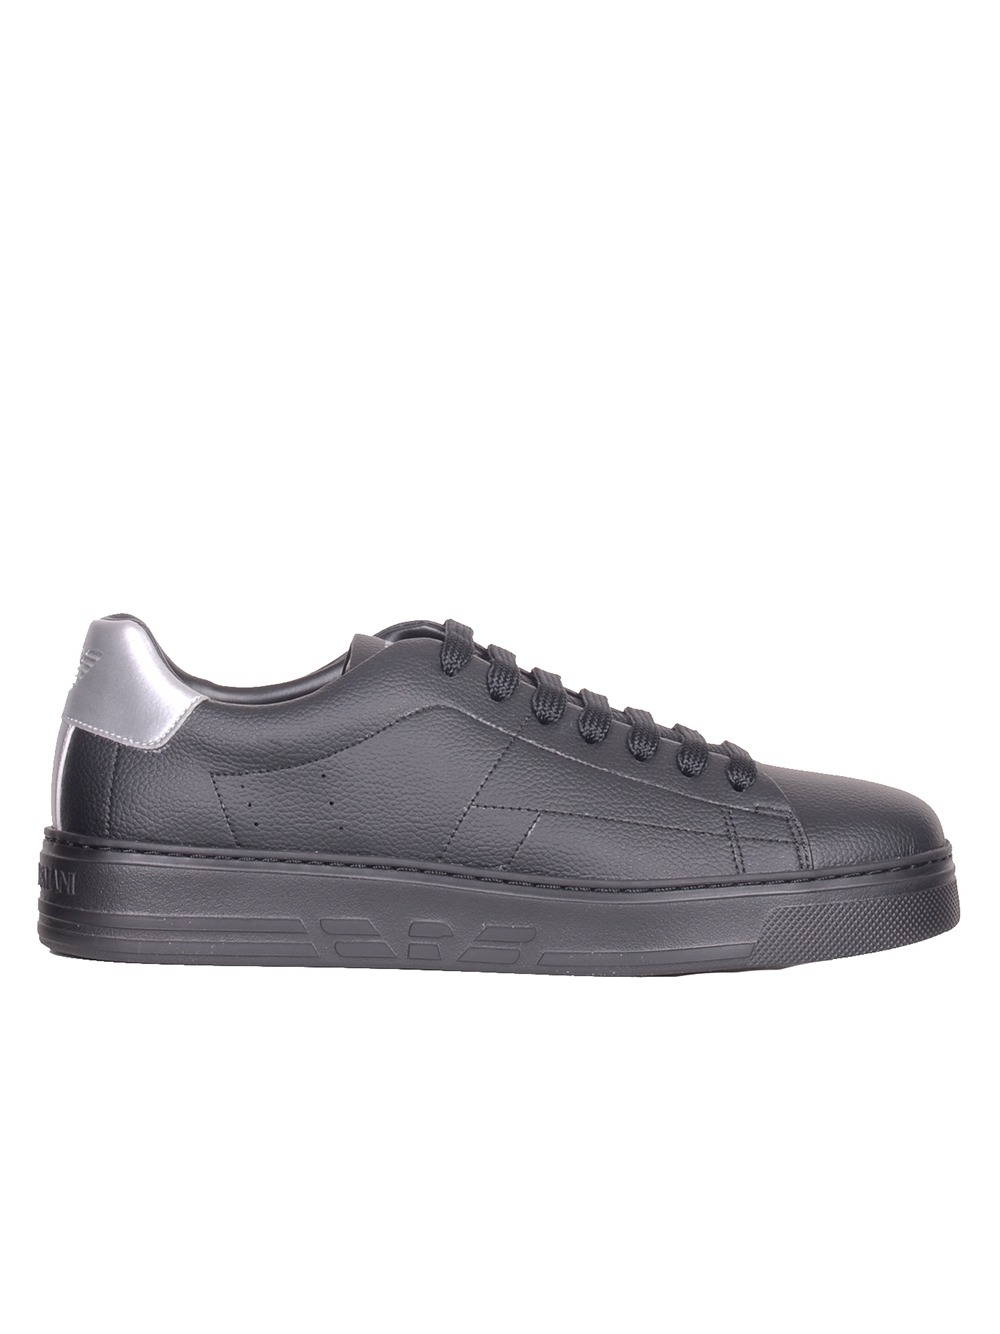 EMPORIO ARMANI Παπούτσια δετά X4X226 XL462 ΜΑΥΡΟ